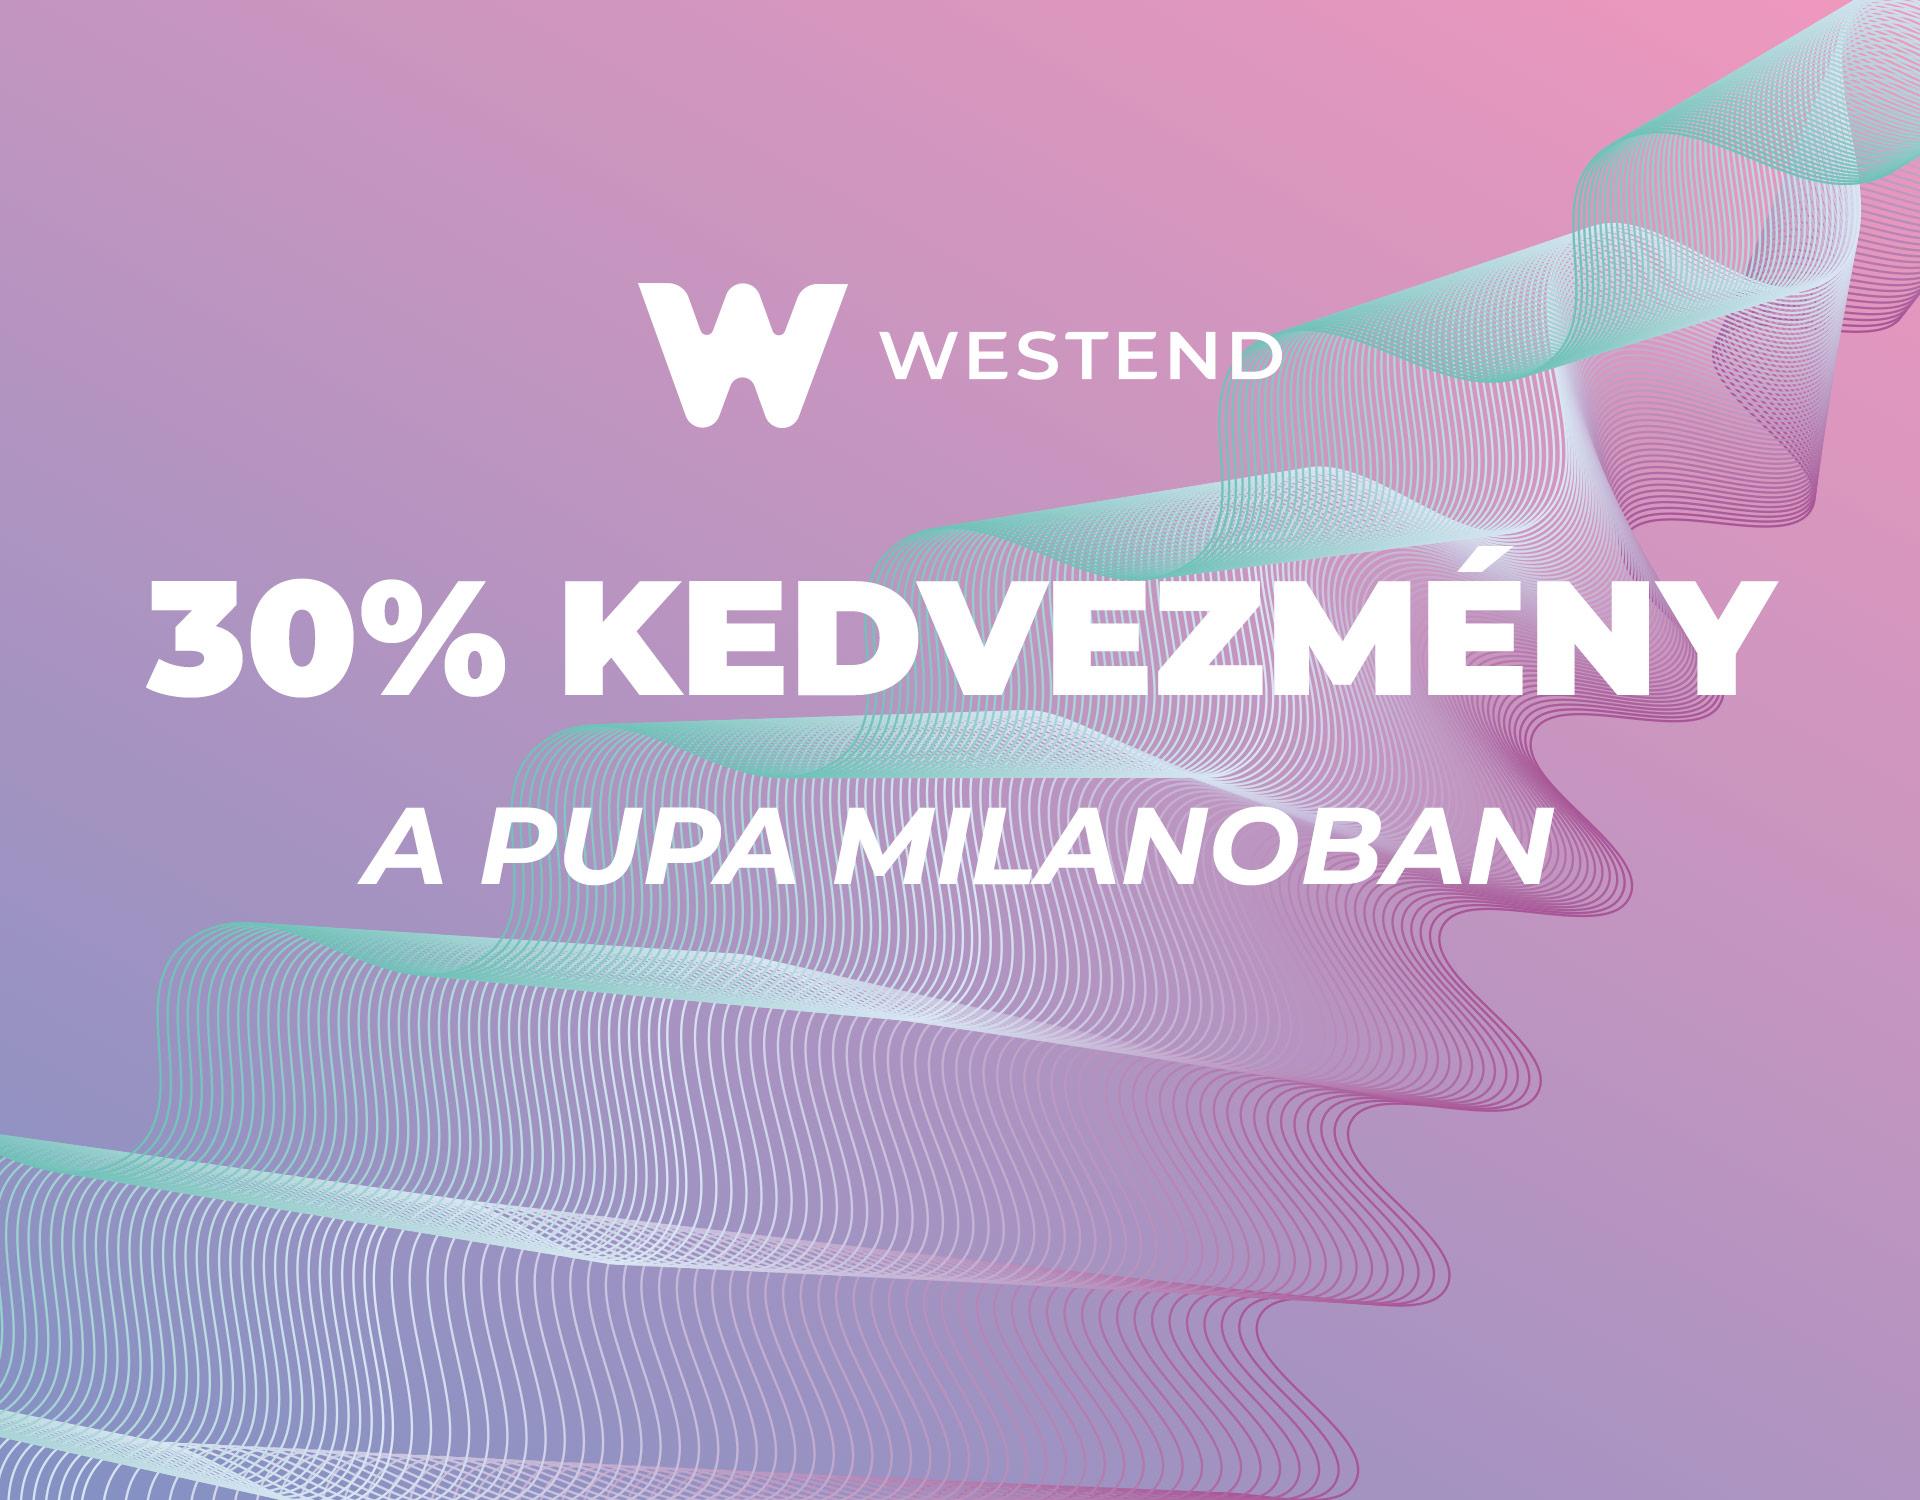 Március 22. - Pupa Milano kupon